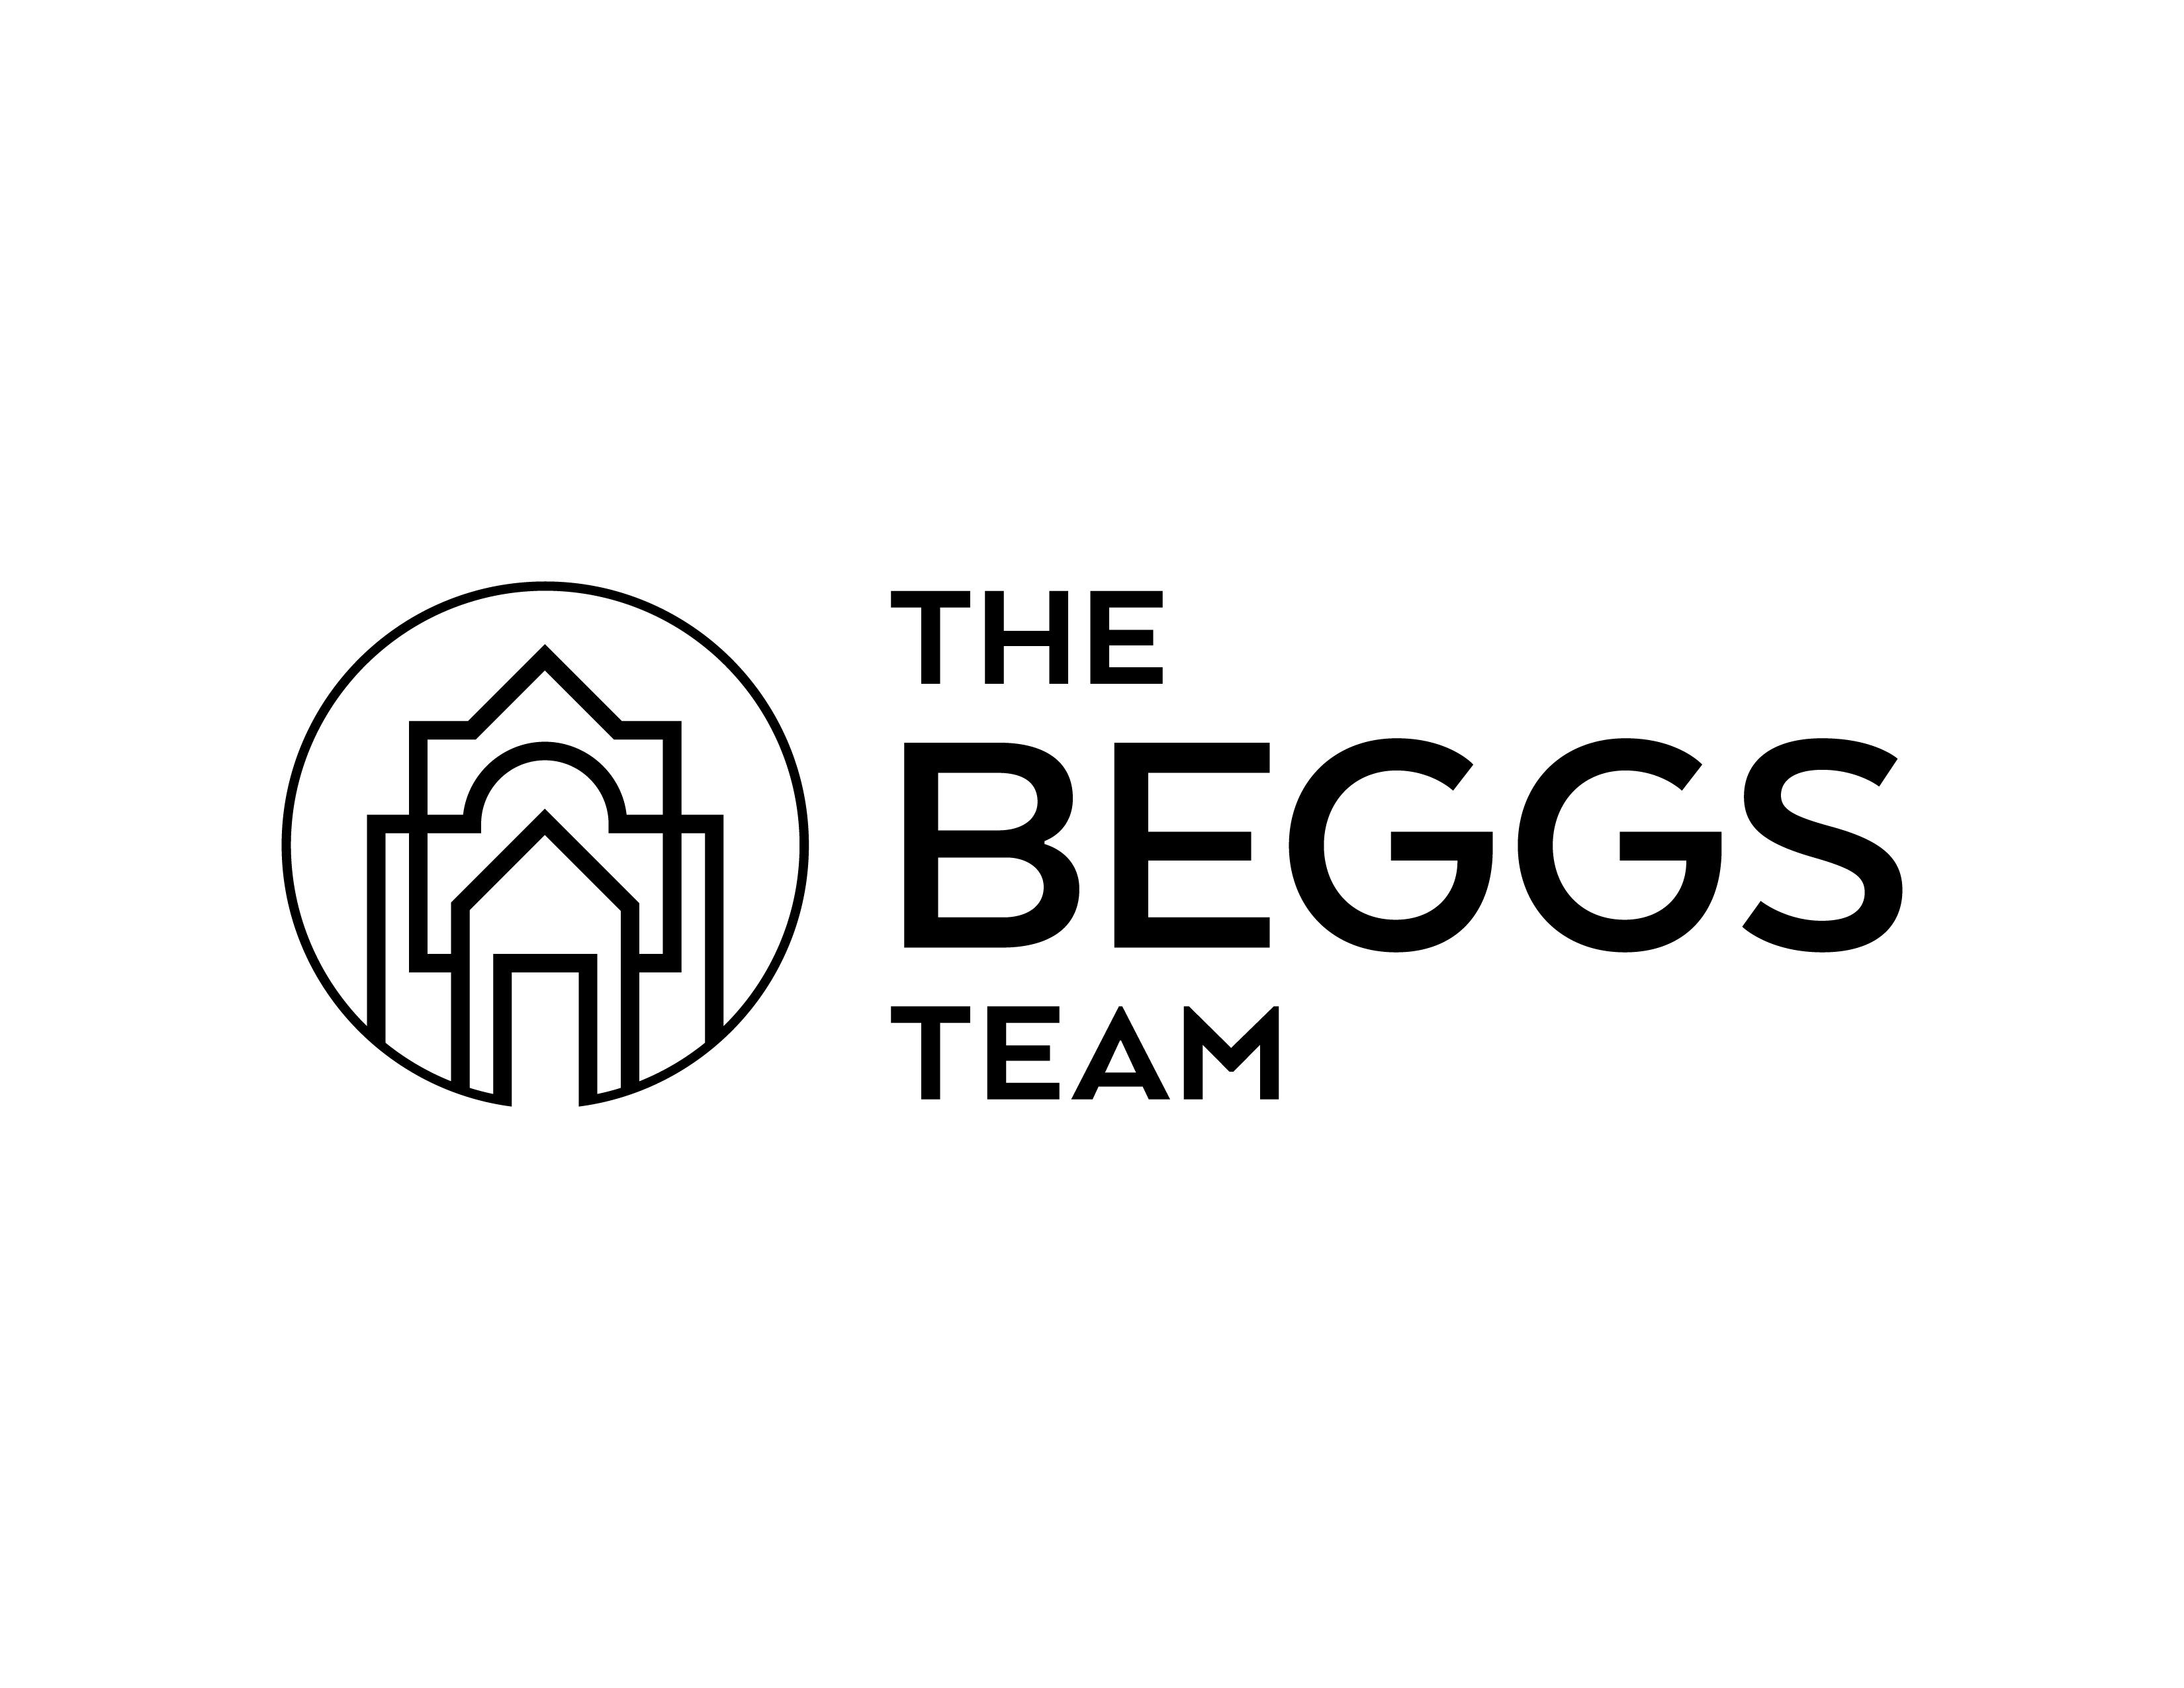 The Beggs Team at Sothebys International Realty logo